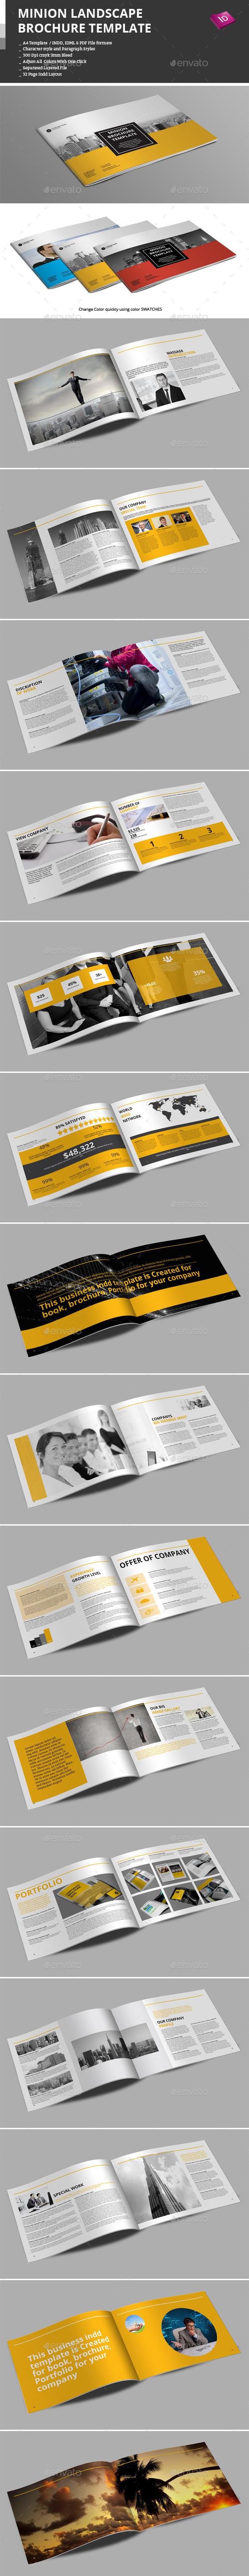 Minion Landscape Brochure Templates | Pinterest | Folleto ...